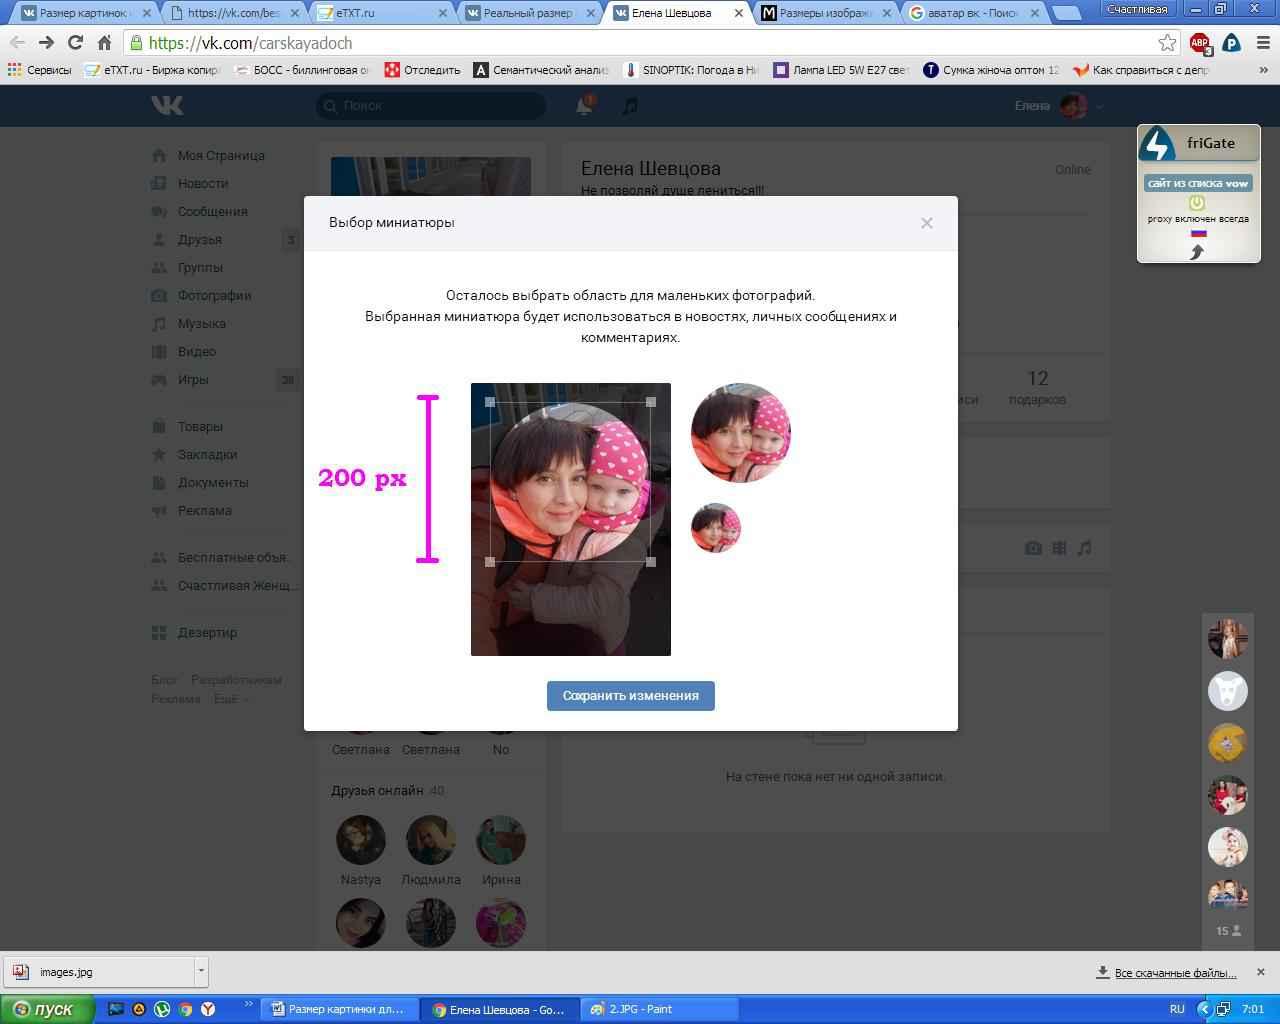 Иллюстрация на тему Размер фото для ВК: аватара, обложки, статьи, товара